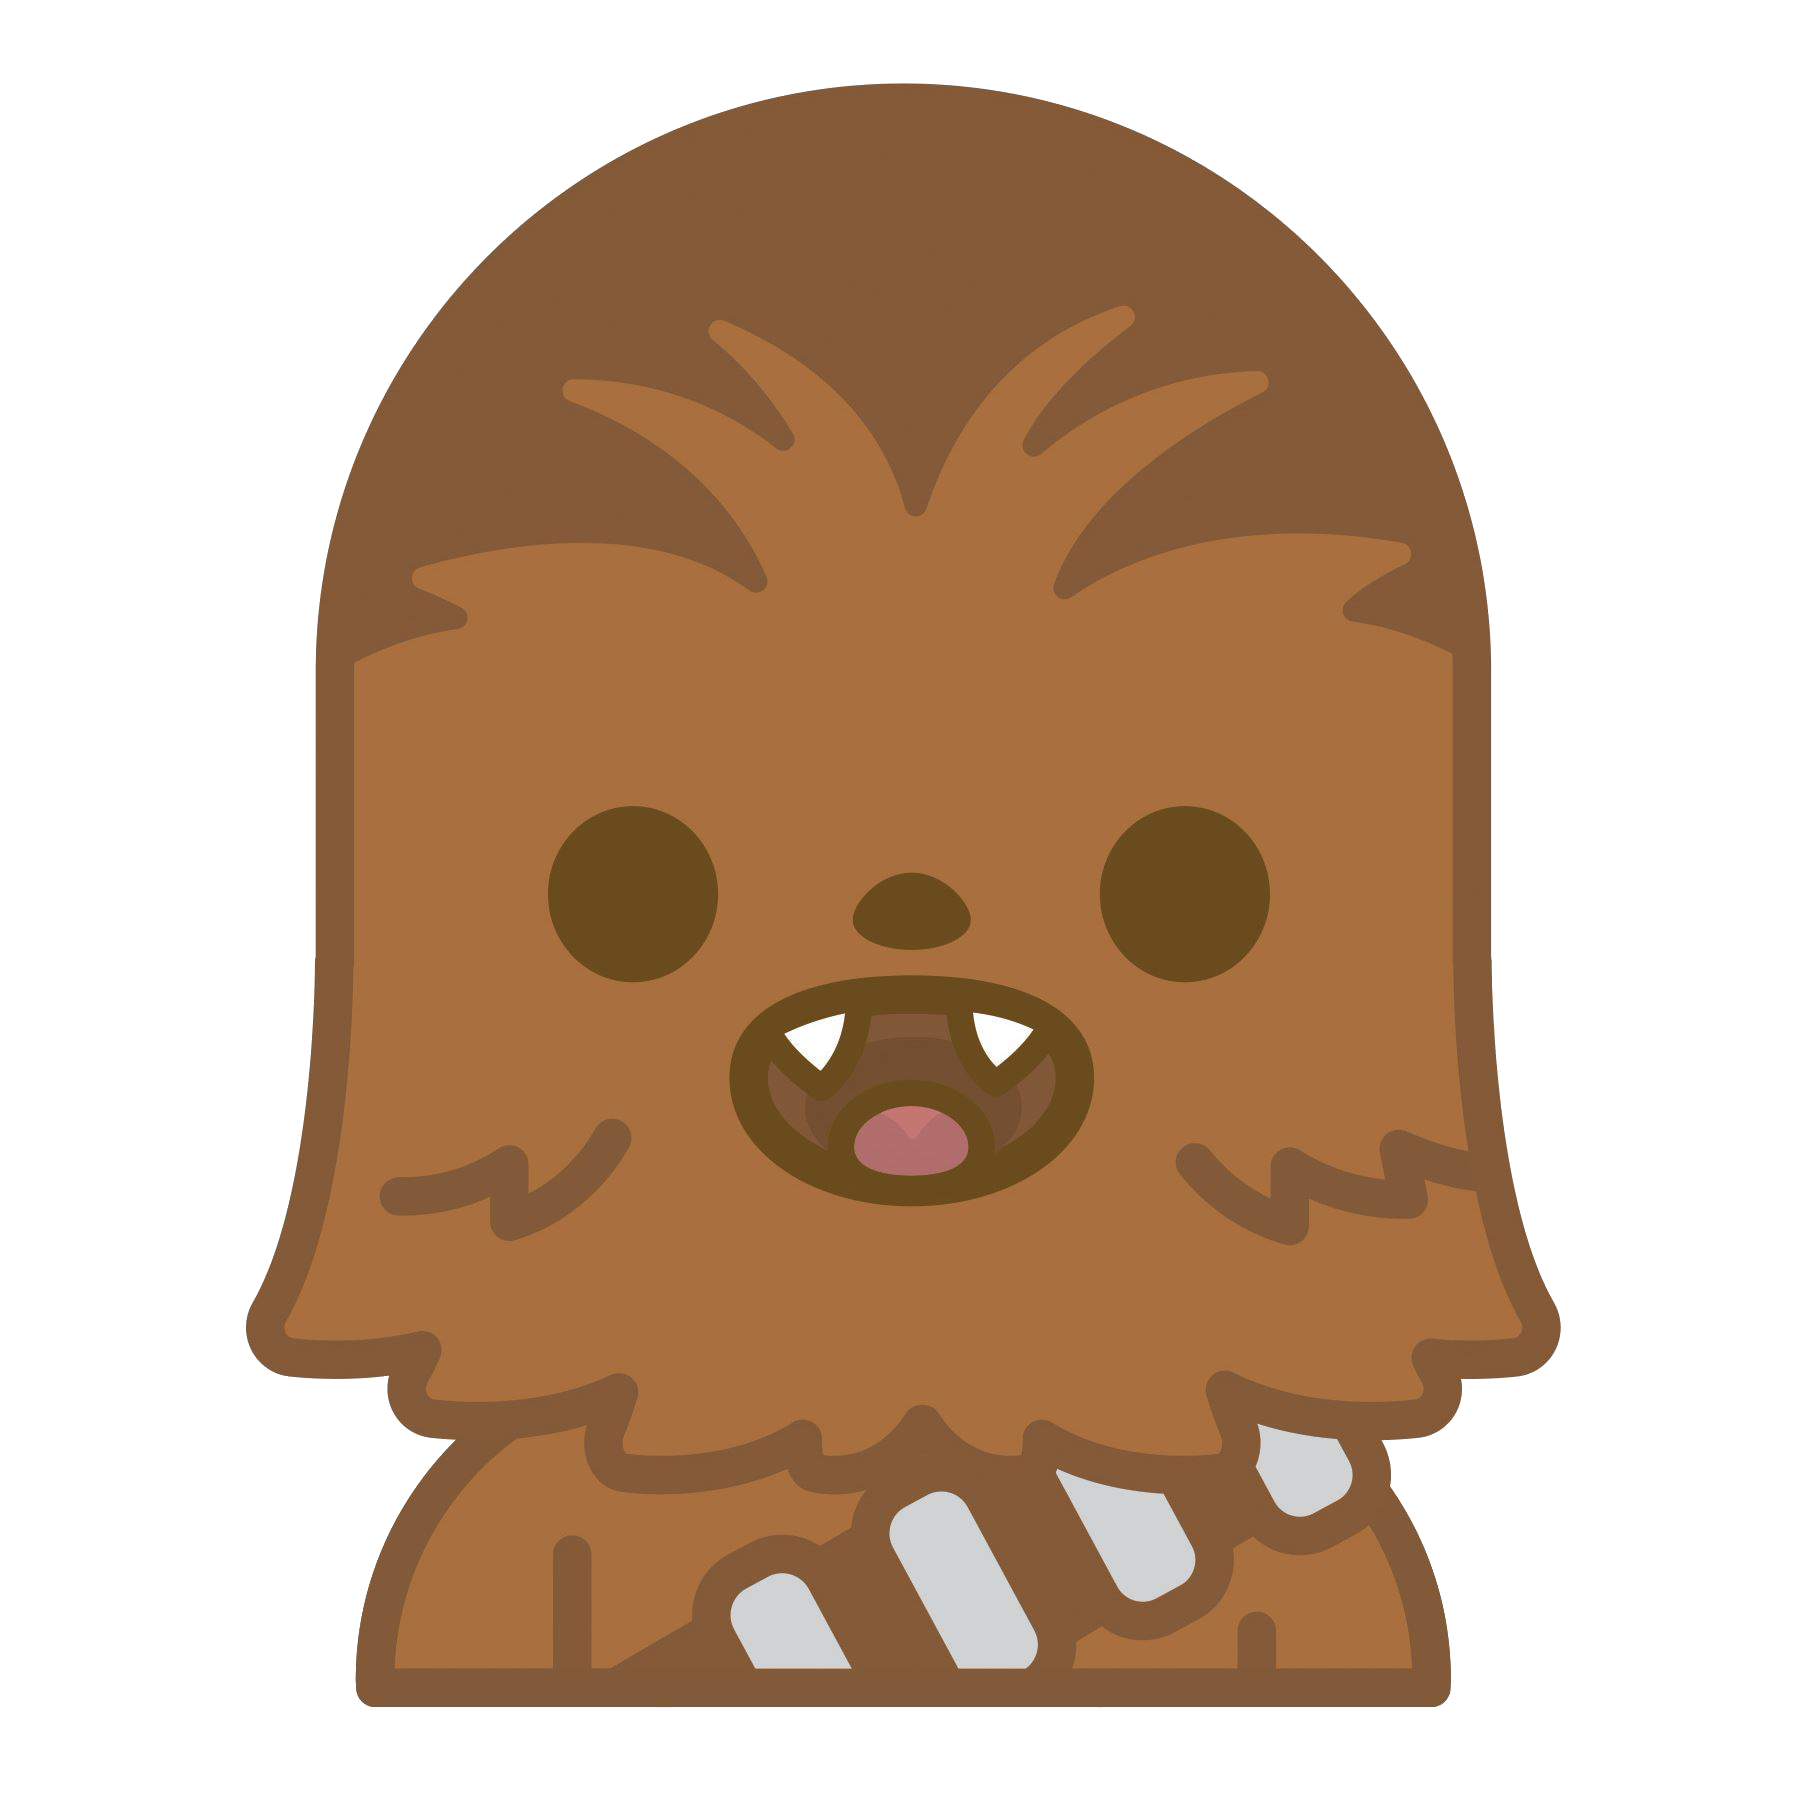 Star wars emoji chewbacca. Starwars clipart animated